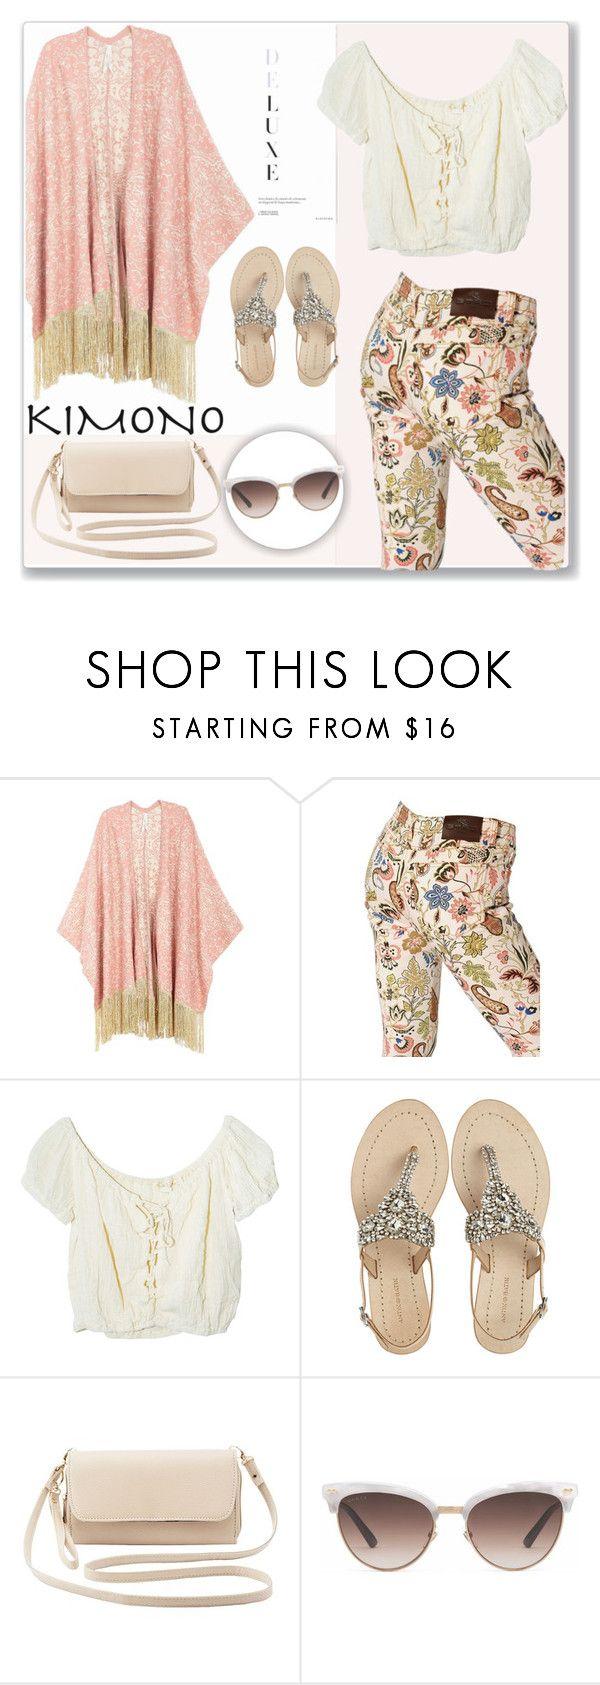 """Kimono Cool"" by sherri40 ❤ liked on Polyvore featuring Melissa McCarthy Seven7, Etro, Jens Pirate Booty, Antik Batik, Charlotte Russe, Gucci, kimonos and plus size clothing"